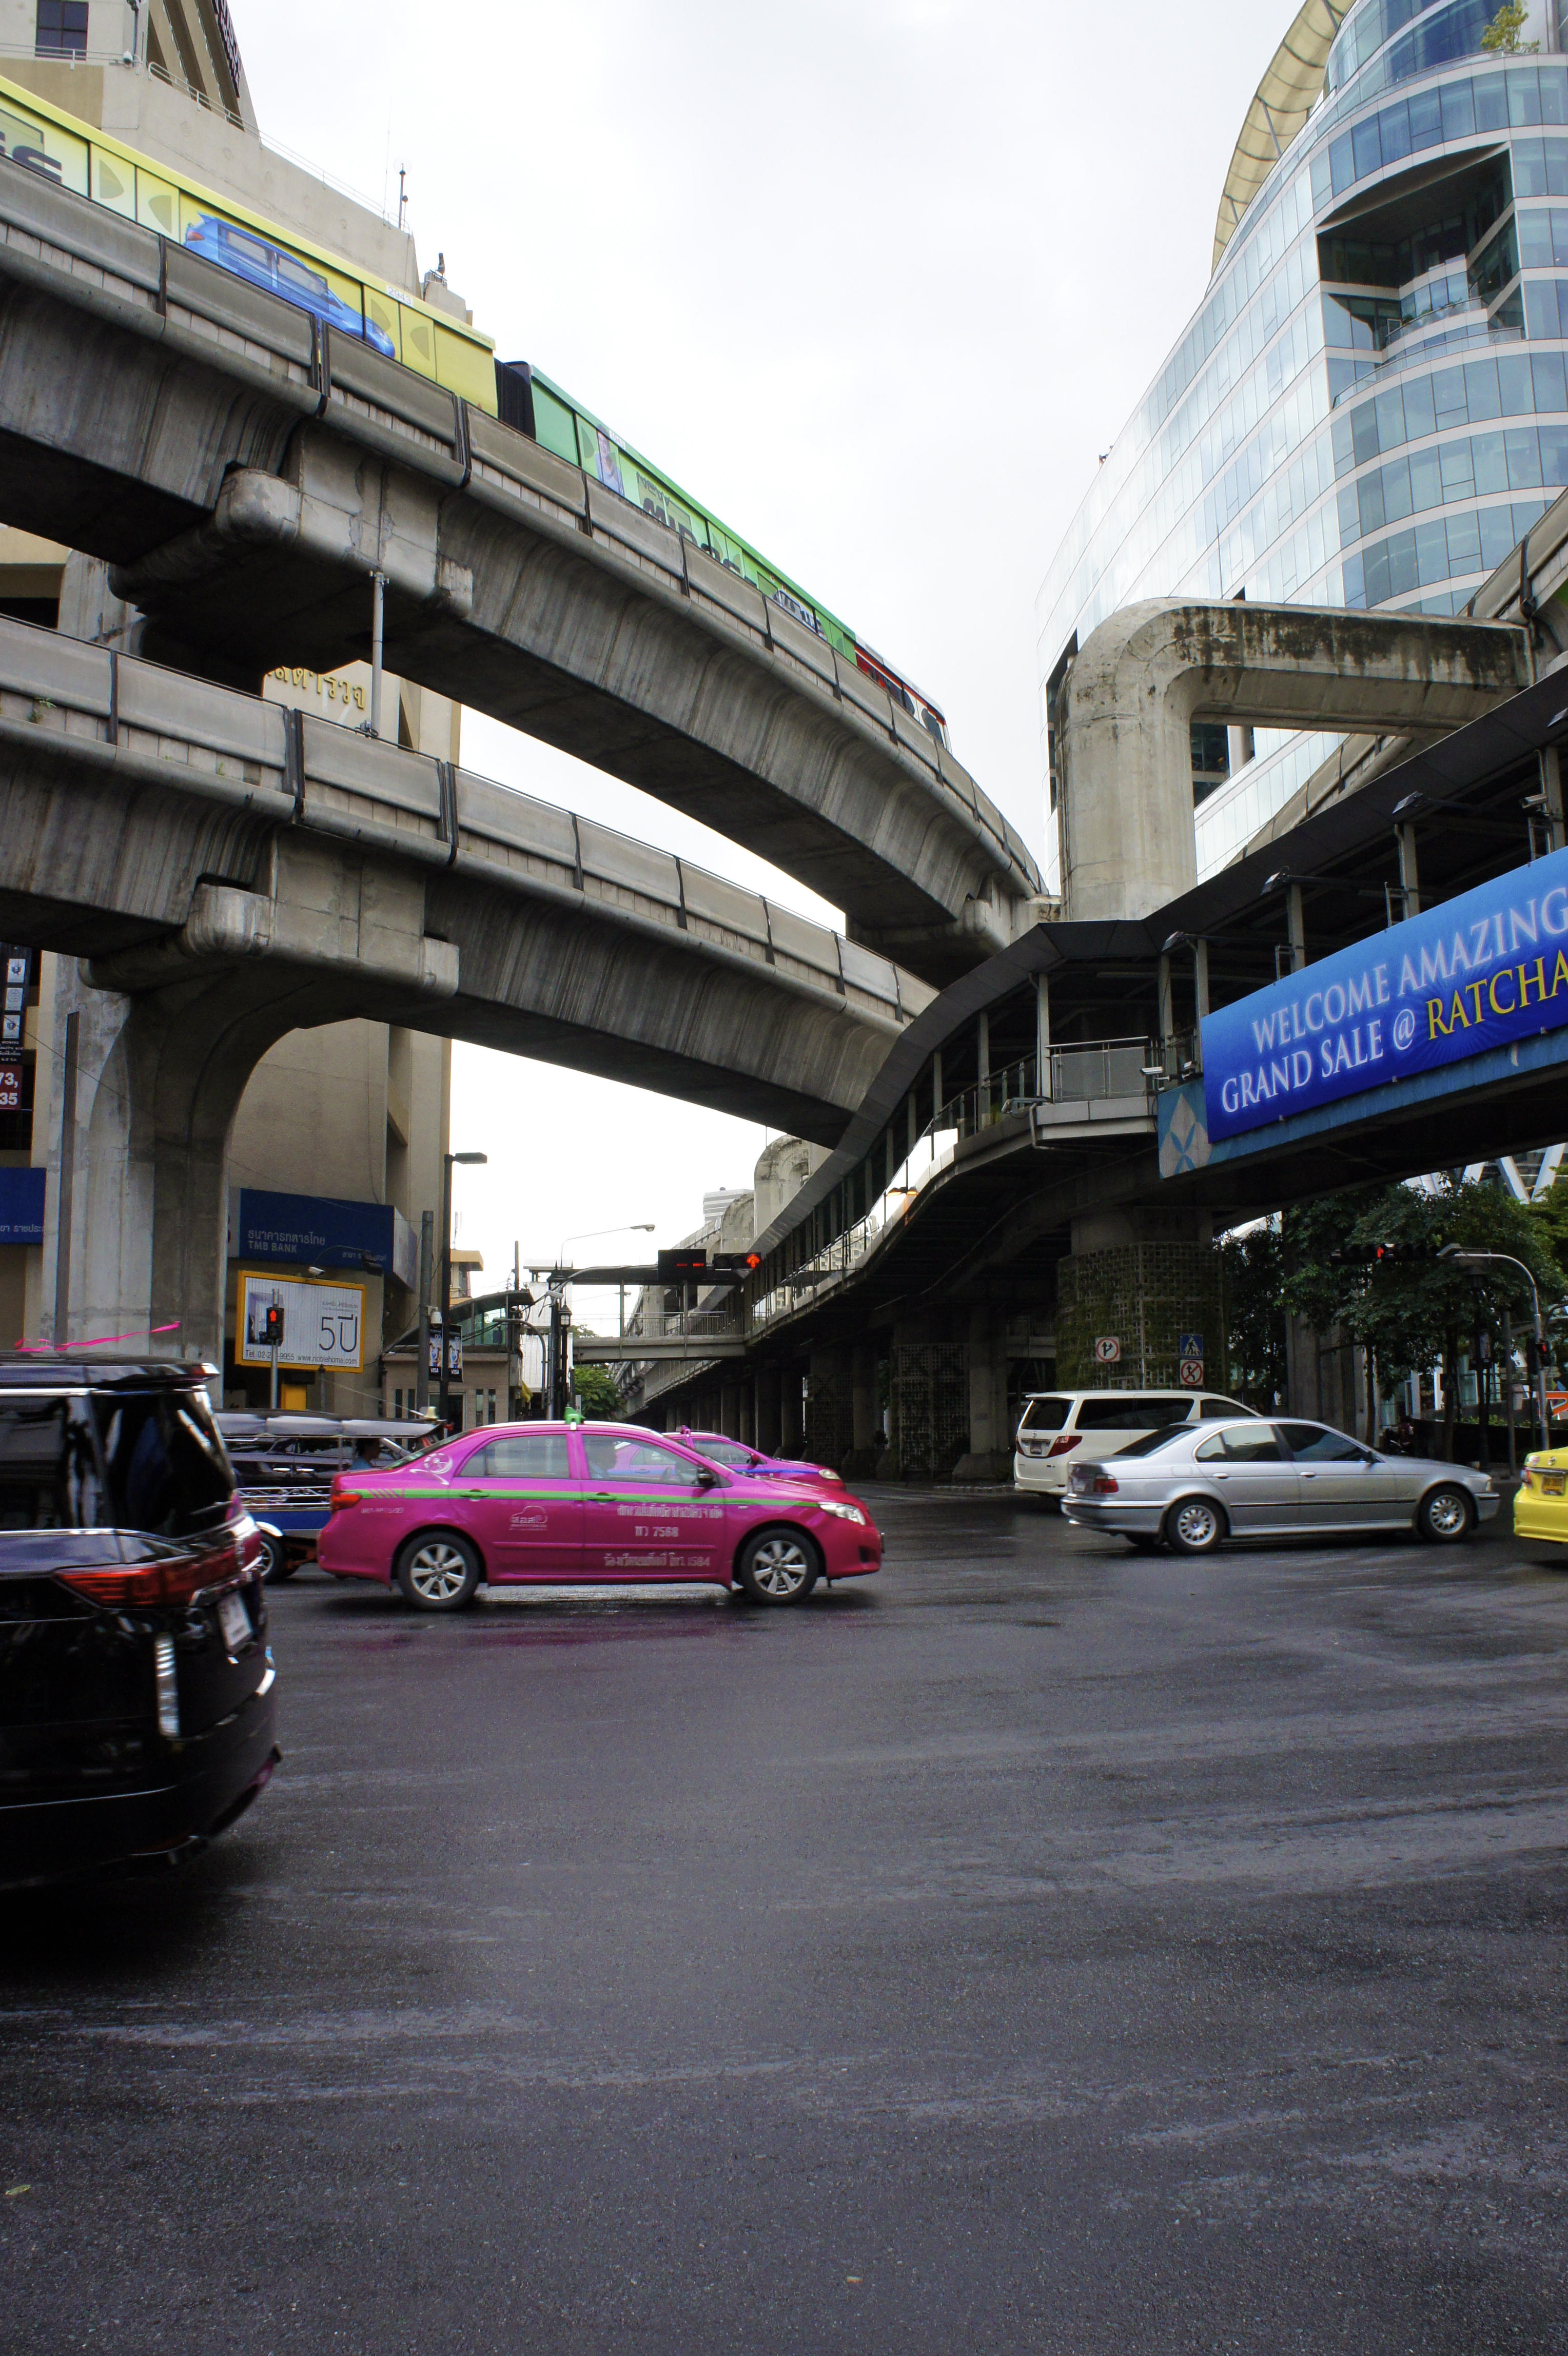 The beauty of a corner, Beauty, Bridge, Cars, Street, HQ Photo